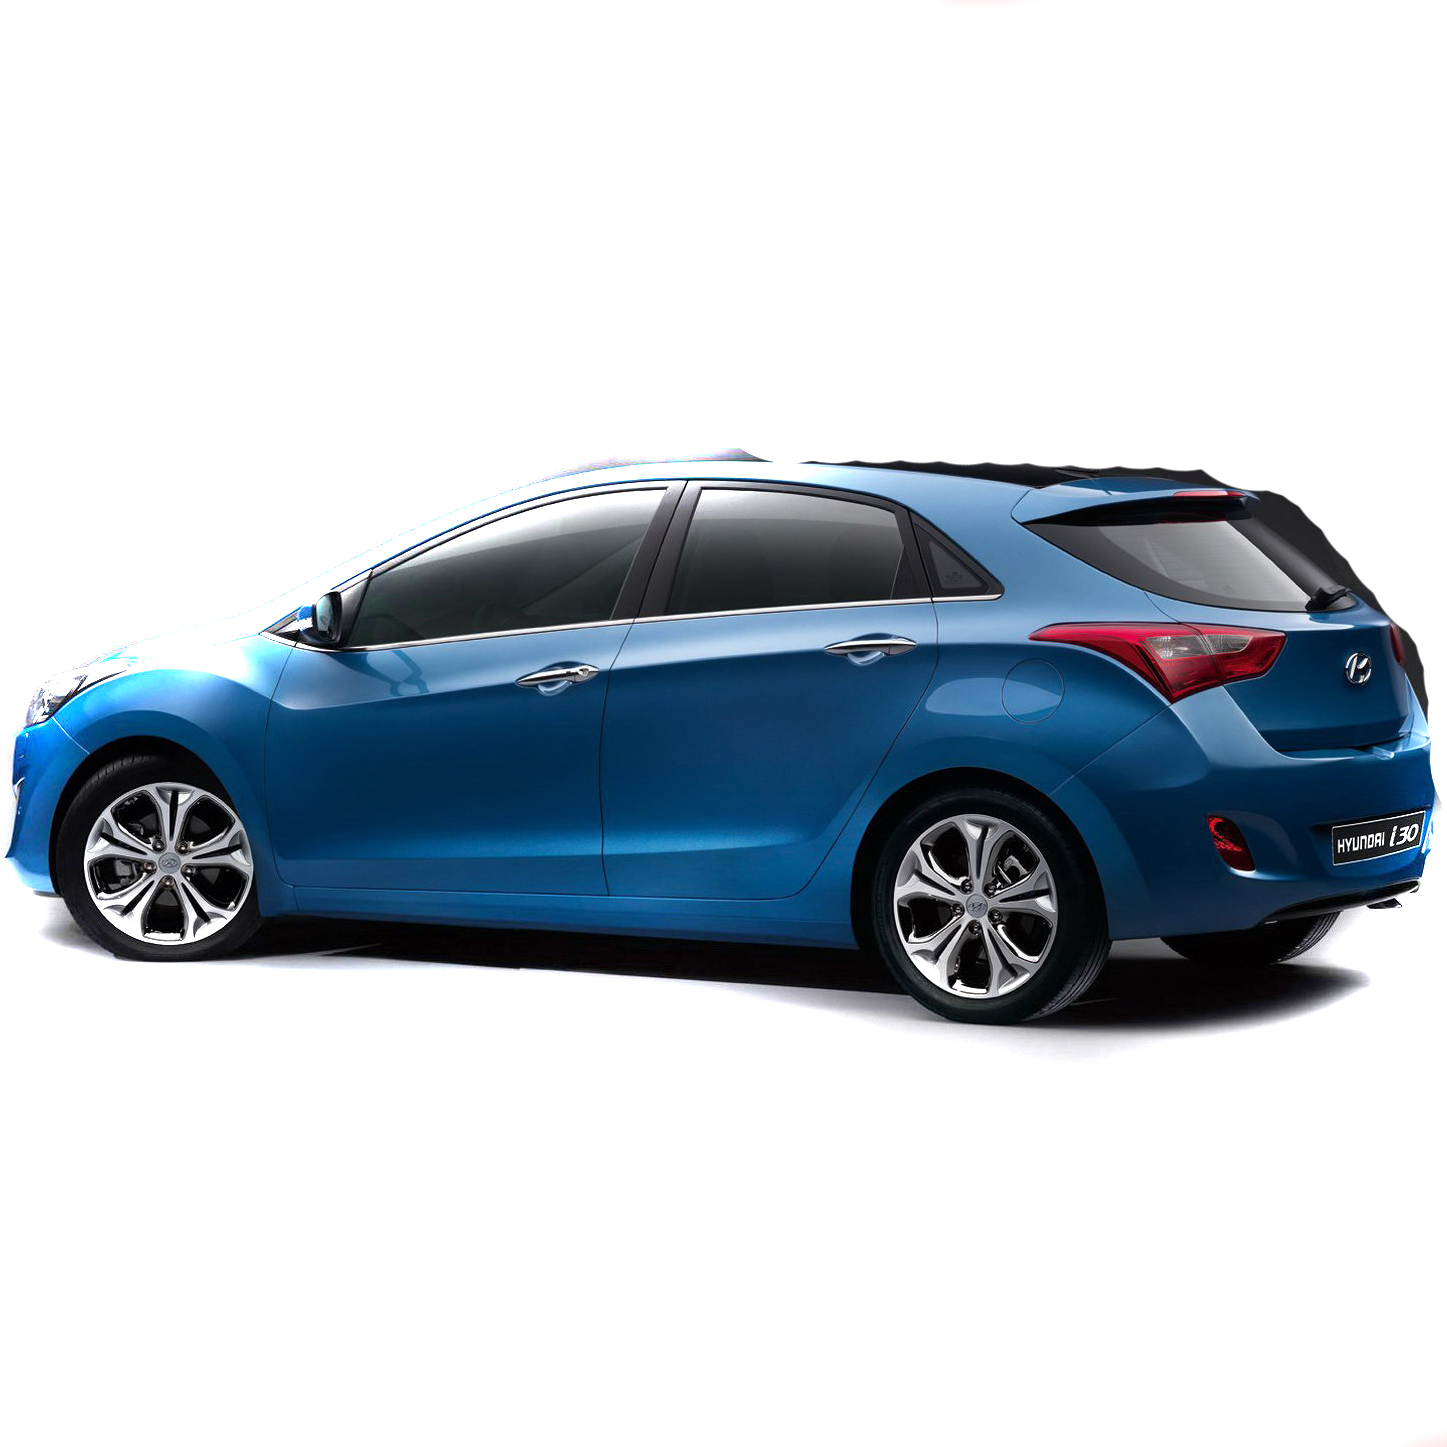 Hyundai i30 2nd Gen 2012 - 2017